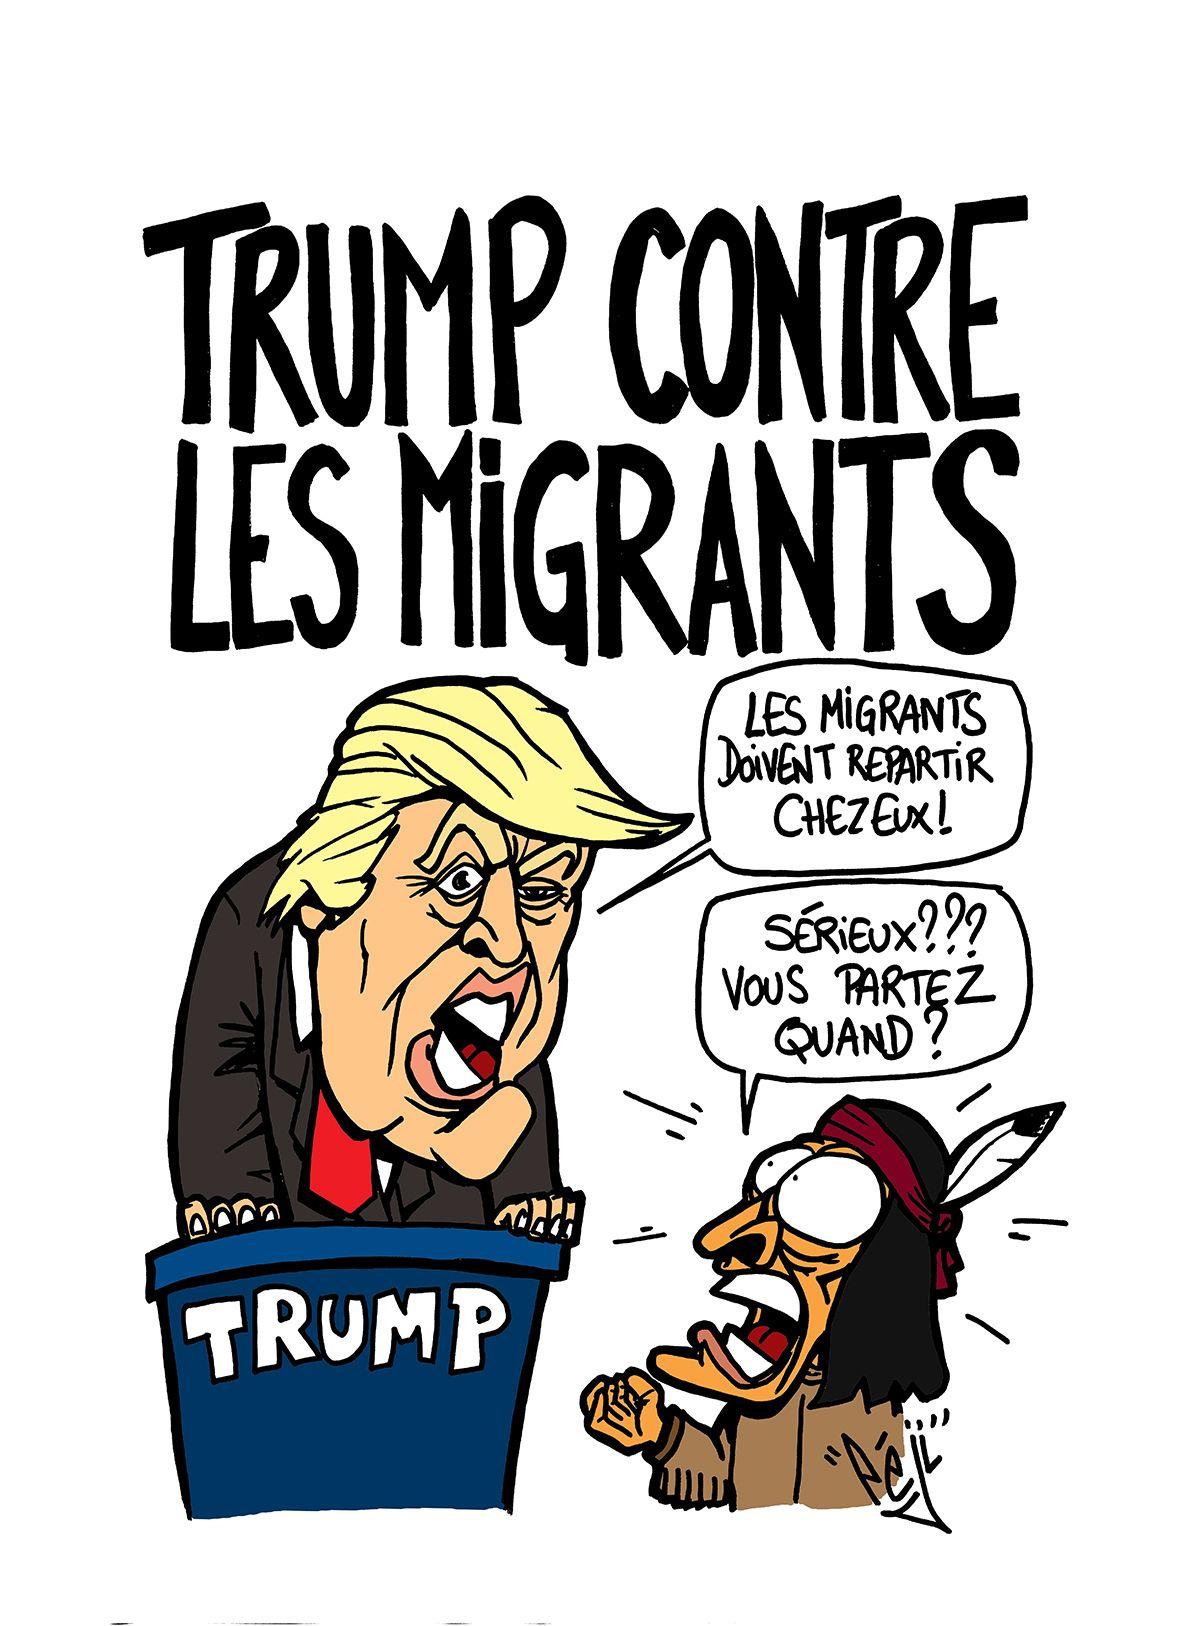 Fabuleux Péji - Caricature : Donald Trump trompe énormément | Caricatures  VD15